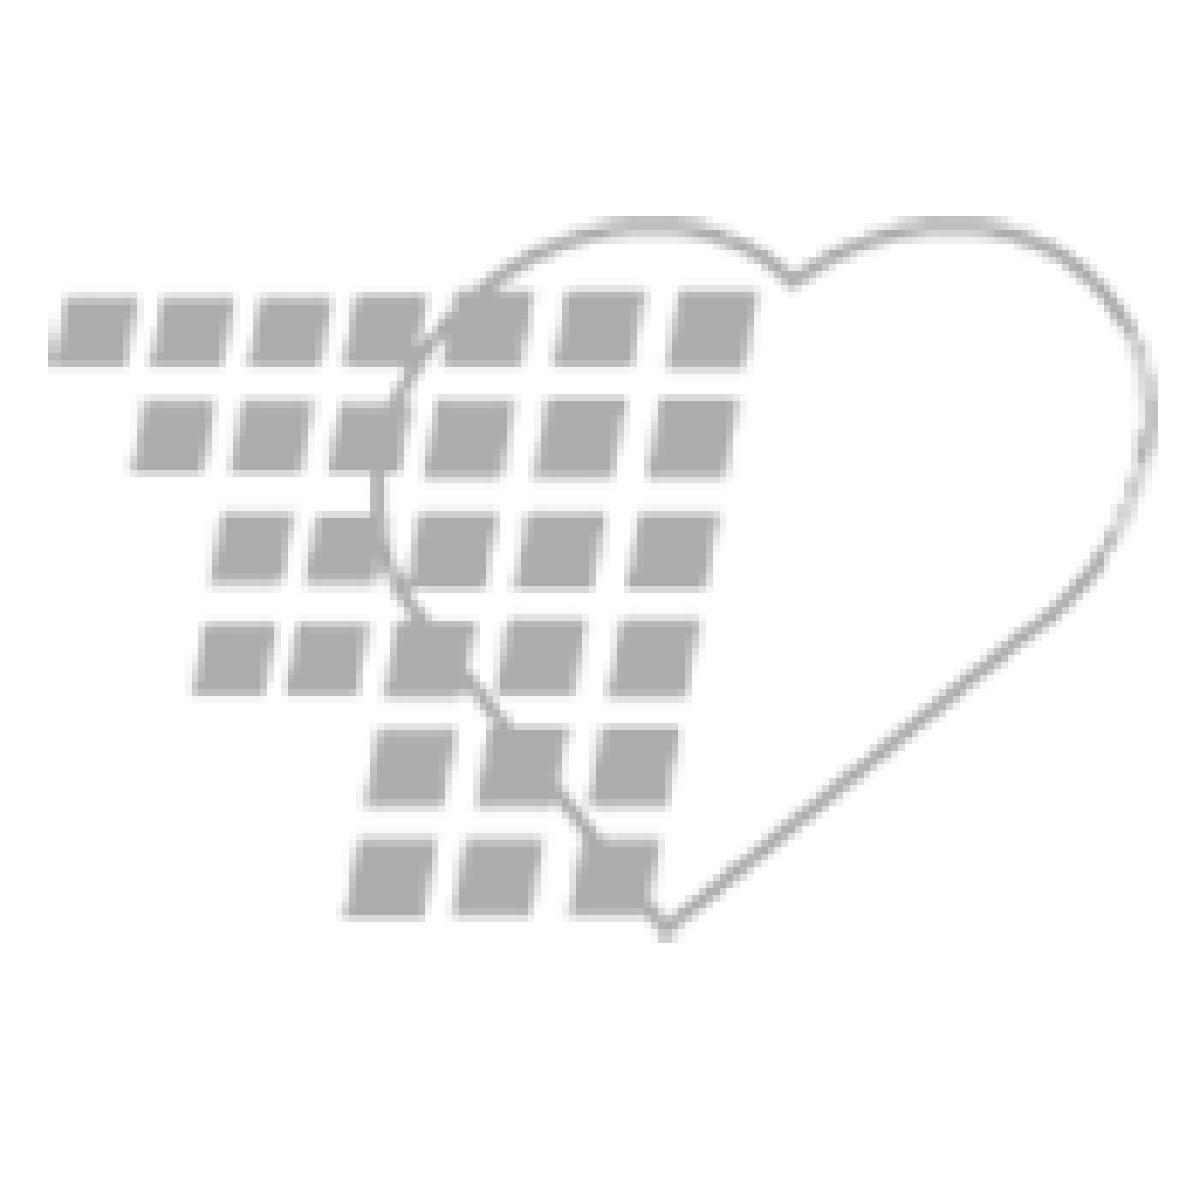 14-17-0729 Nasco Life/form® Simulated Burns Complete Set